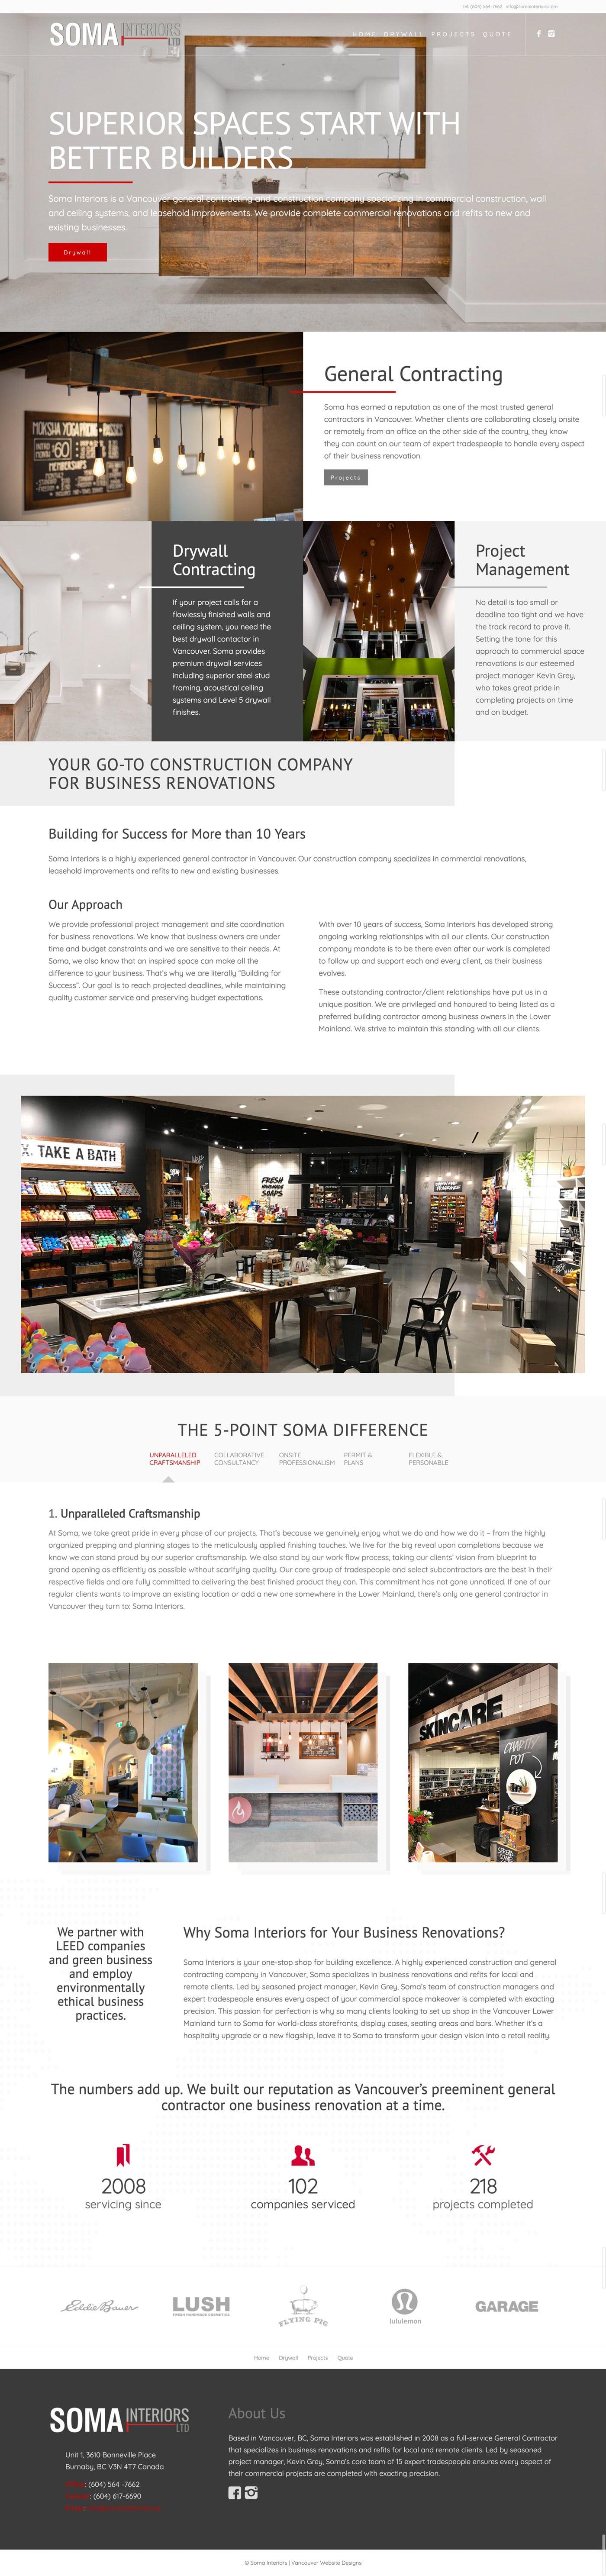 Soma-Interiors-2-1400-min